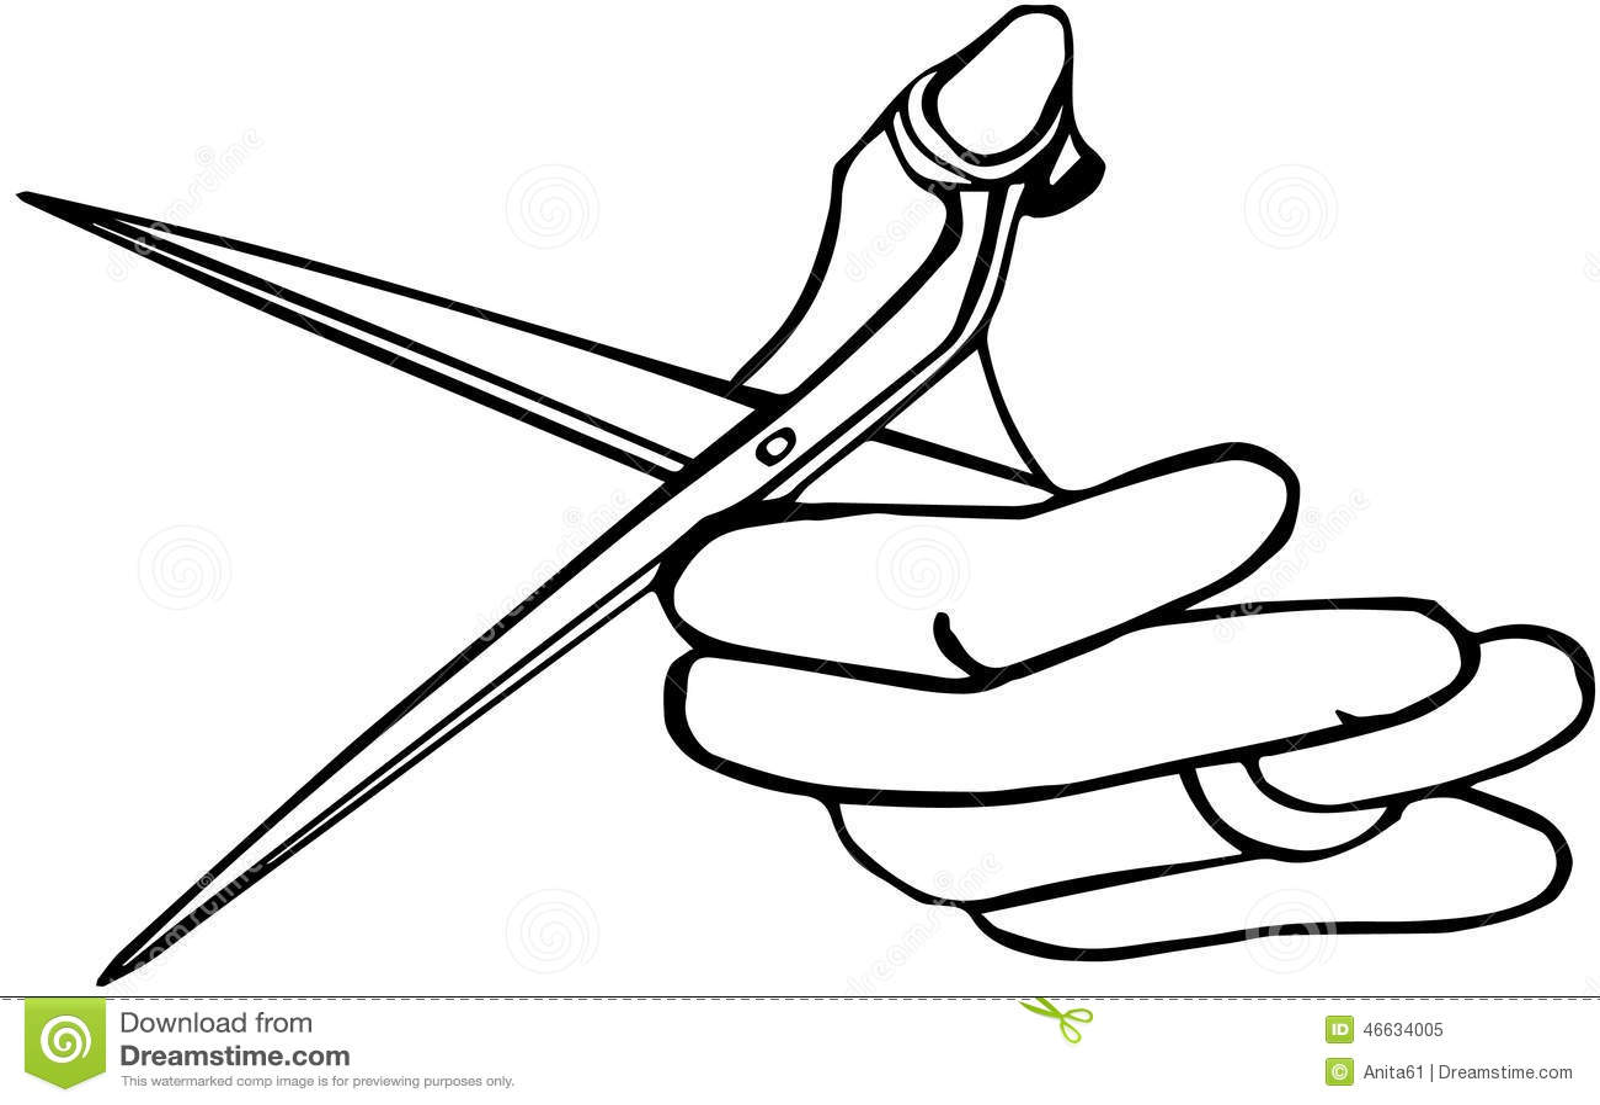 Hand holding scissors stock illustration. Illustration of ...